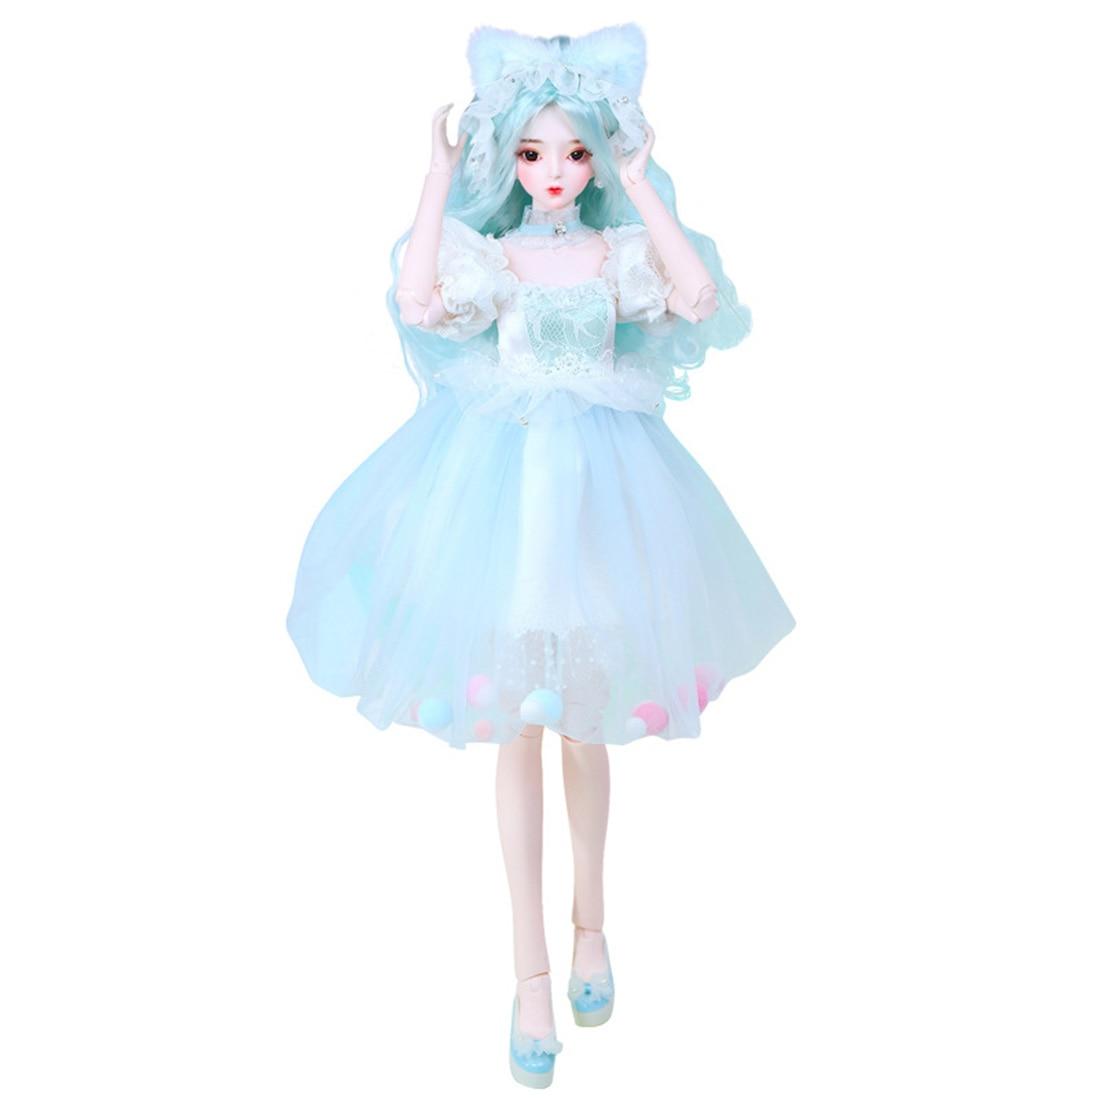 Muñeca BJD de 60cm, conjunto de muñecas de princesa de boda, juguetes de moda para niños, maquillaje pintado a mano de manesa (cara desmontable/cabeza integrada)